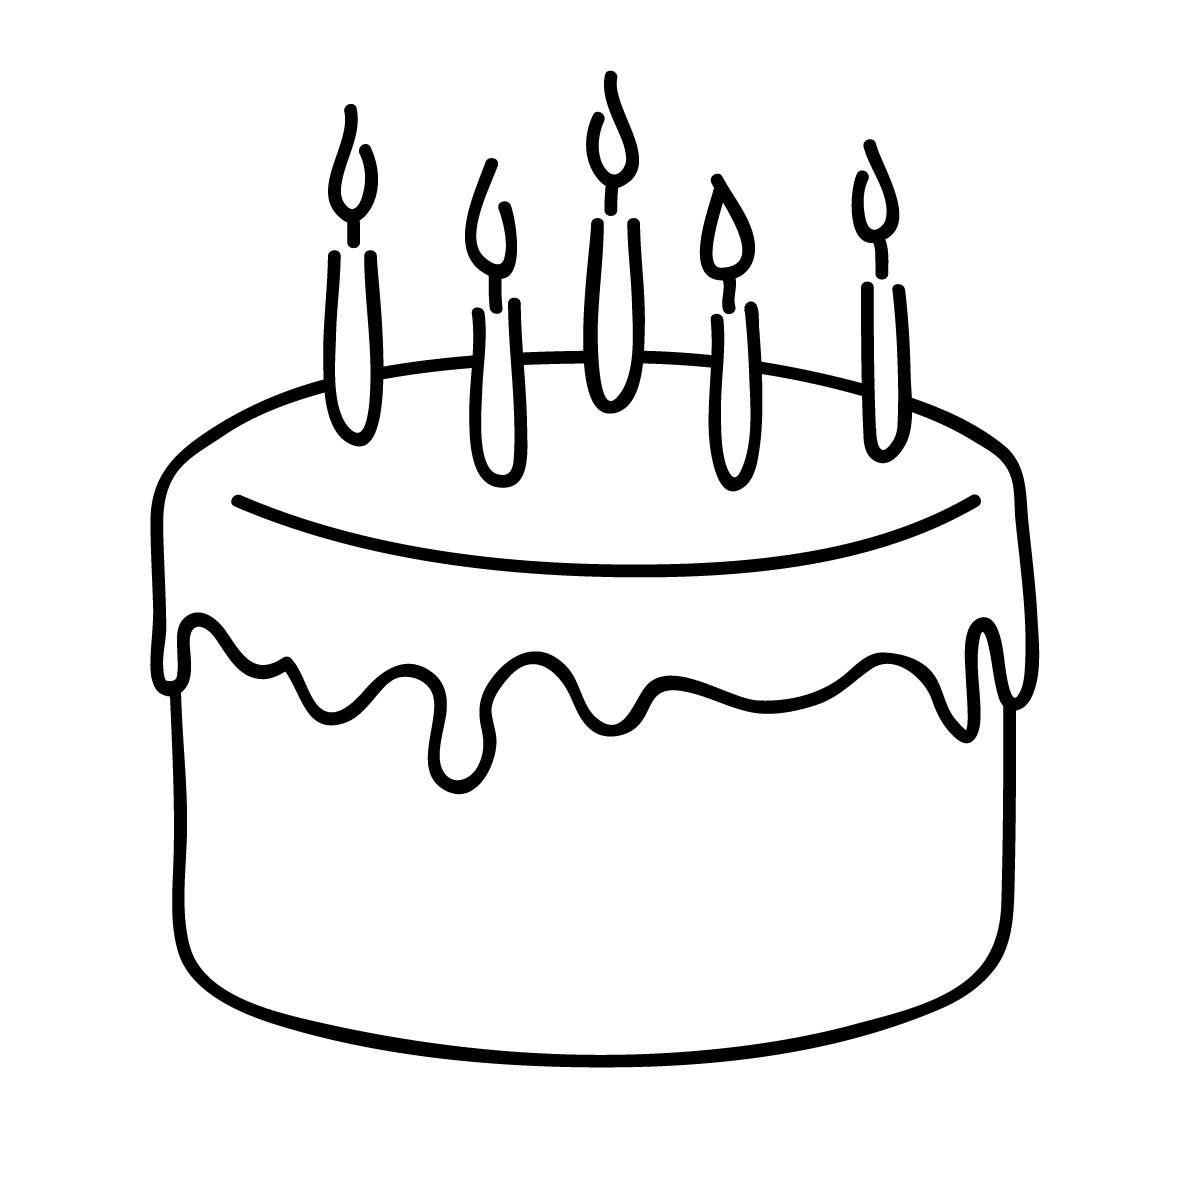 Birthday Cake Clipart Black And White.